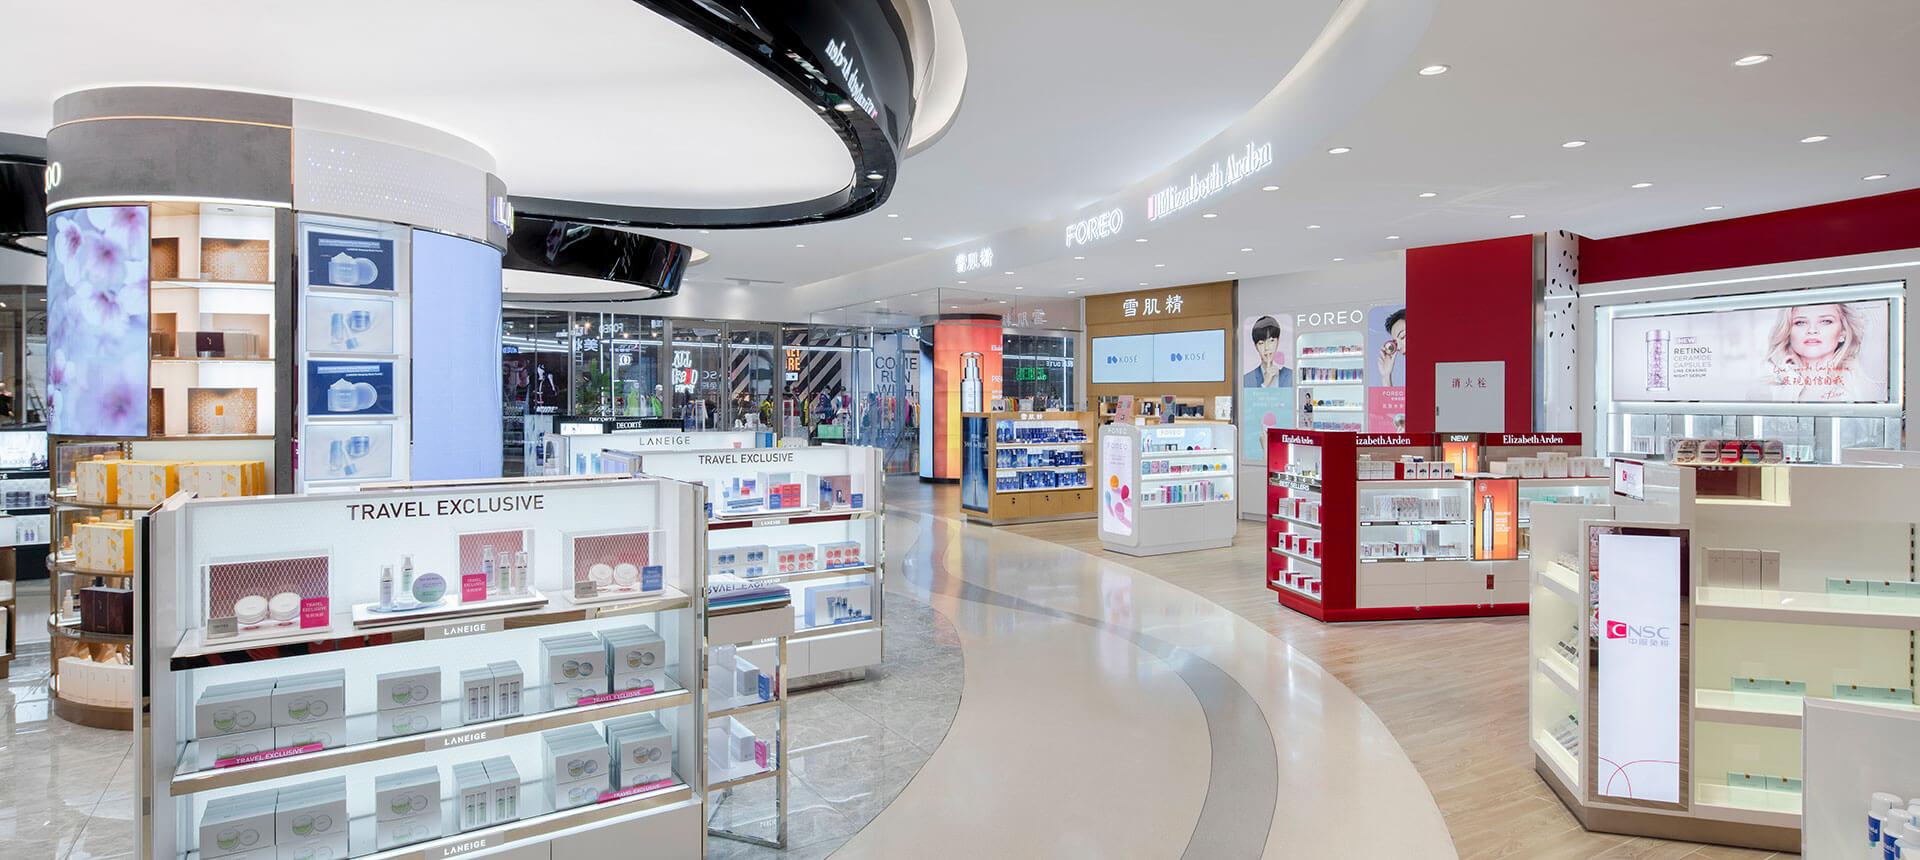 Dalian Duty Free Shop 2